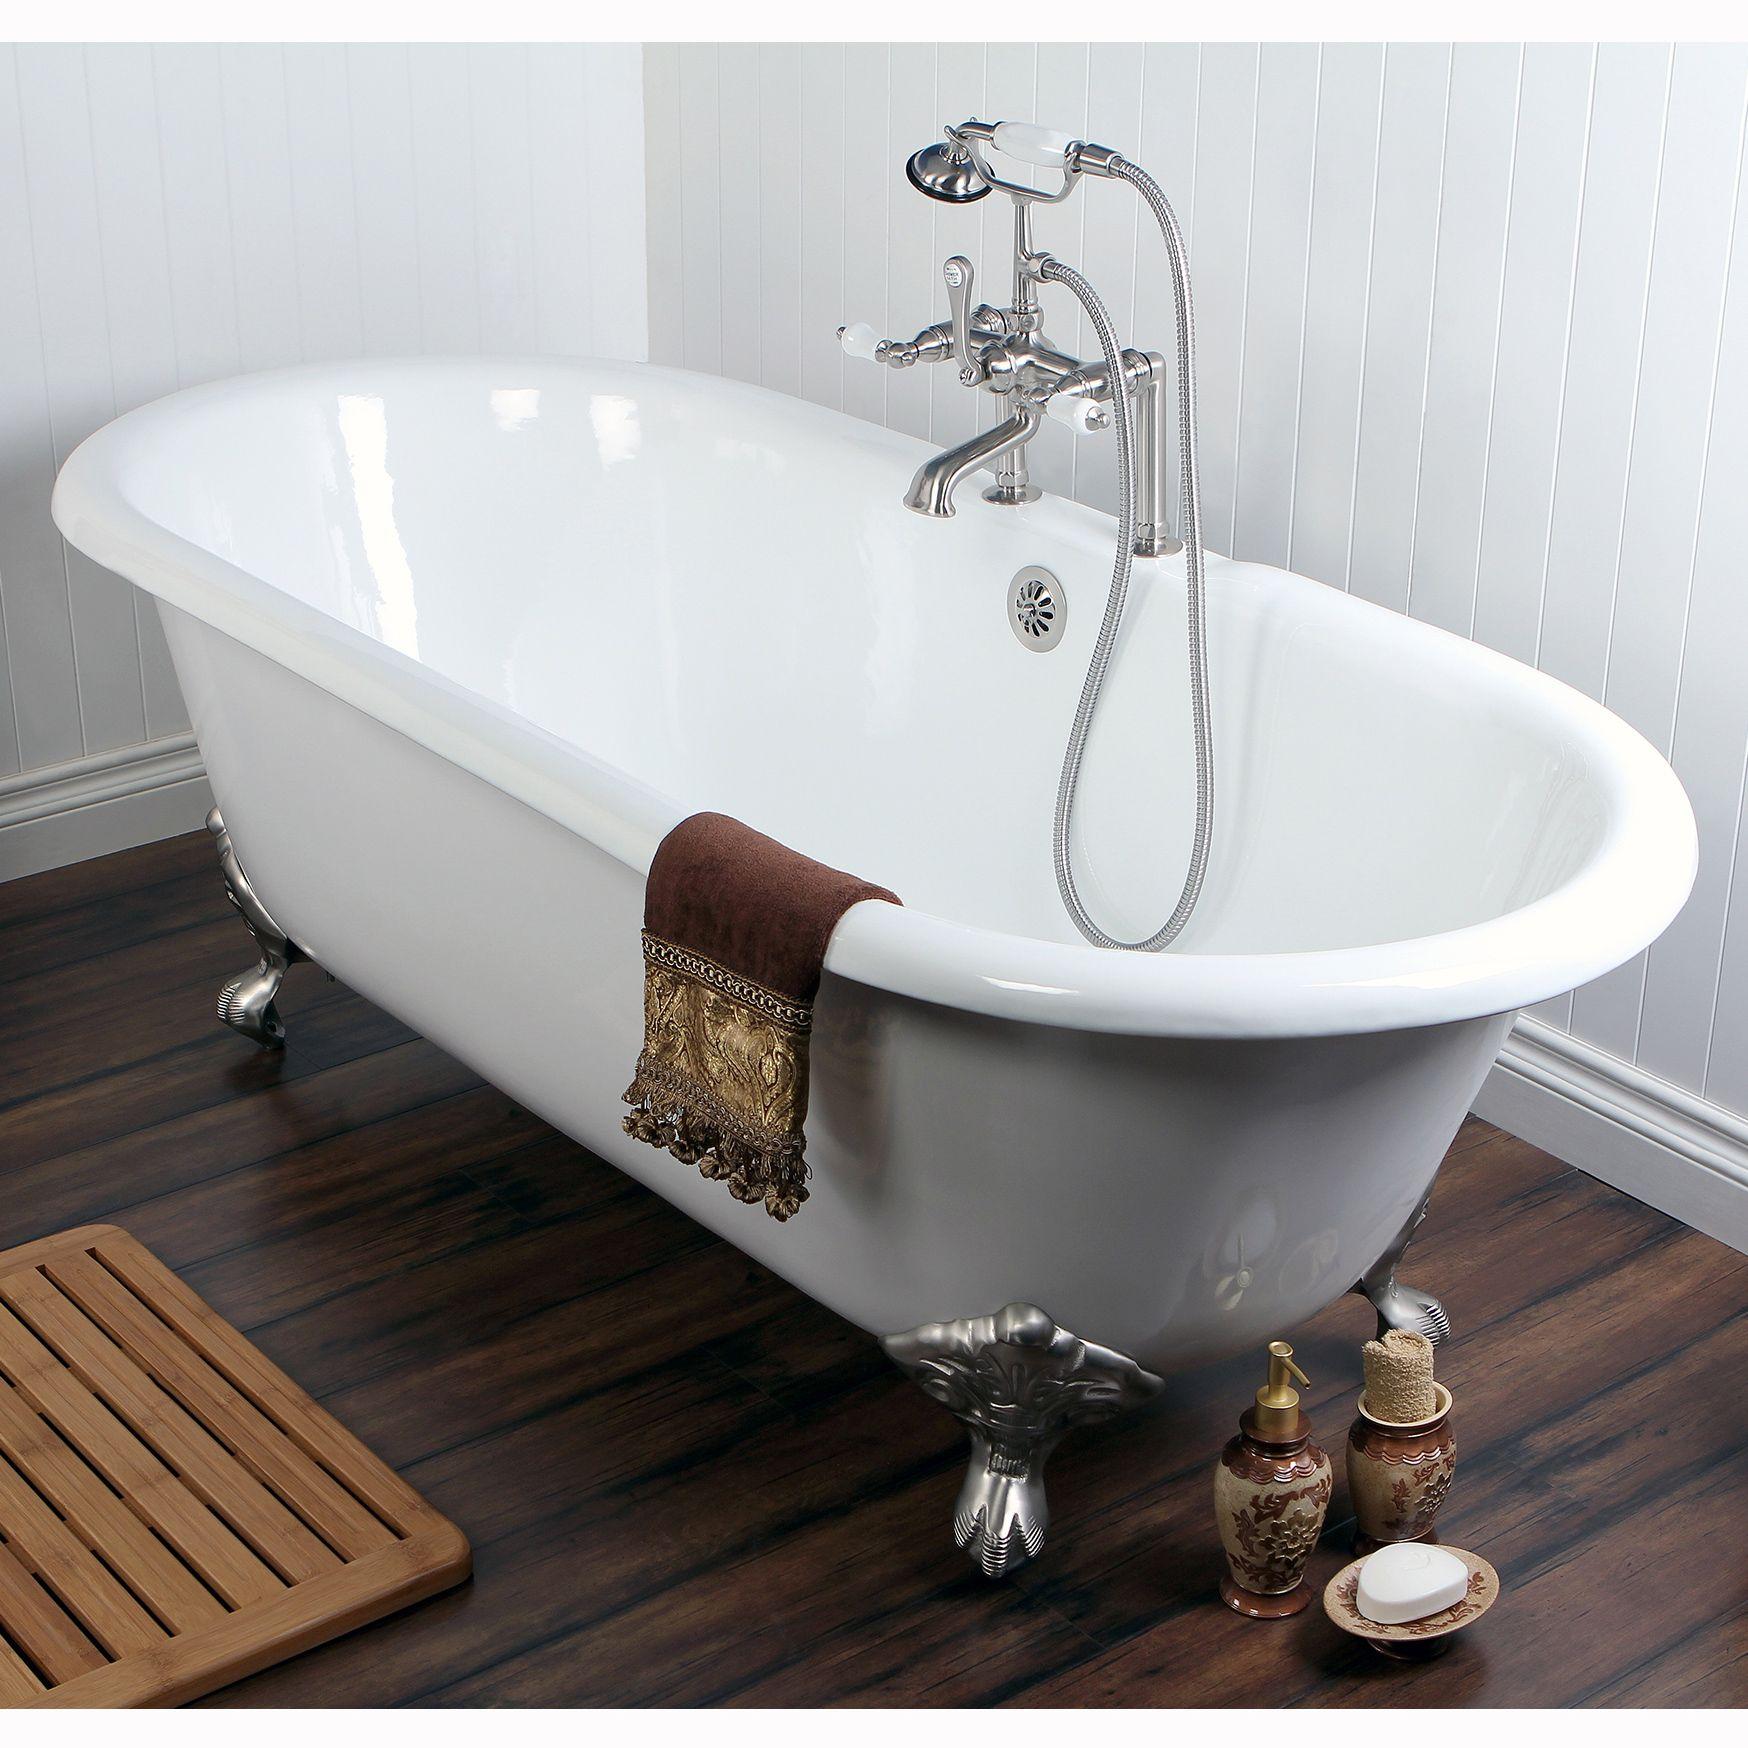 Inspiring Unique Tubs Design Ideas with Cast Iron Bathtub: Cozy Dark ...